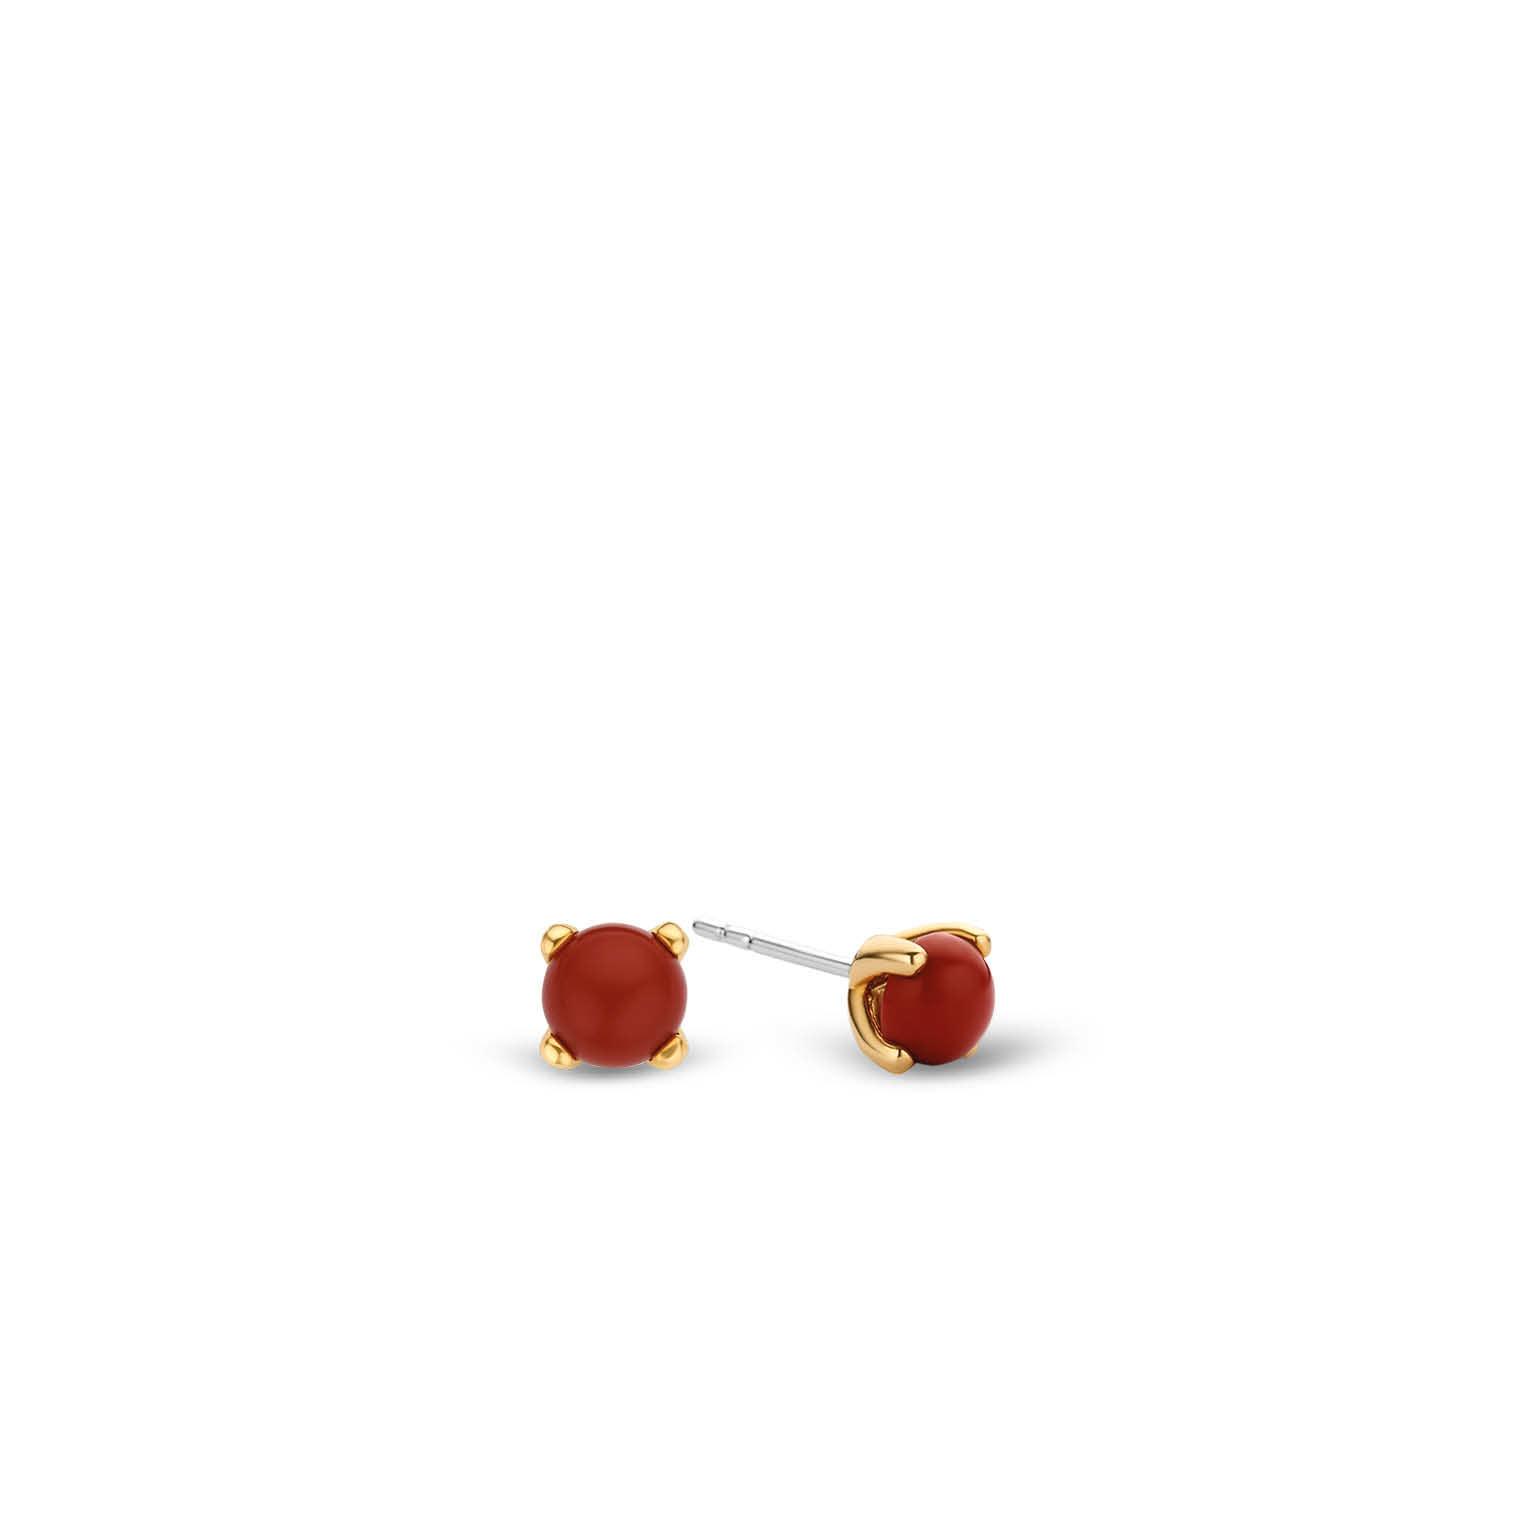 TI SENTO - Milano Earrings 7768CR-3